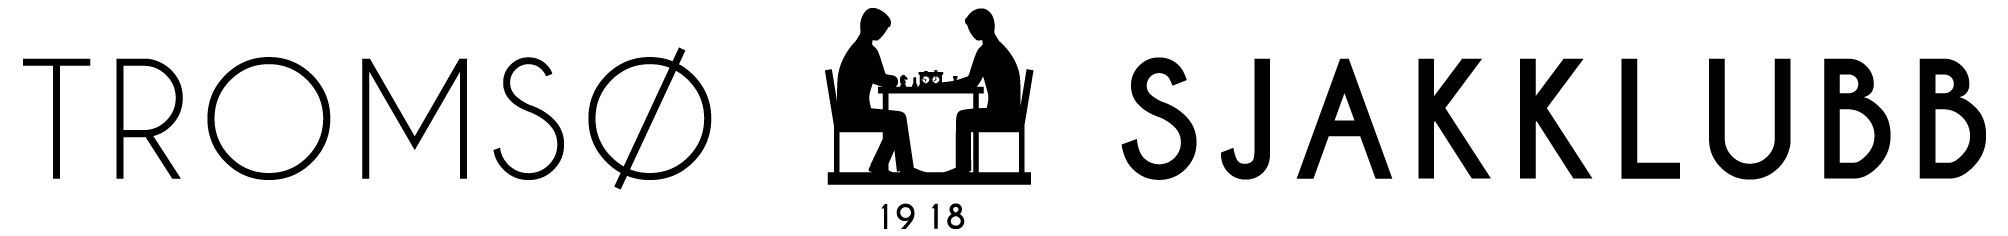 Tromsø Sjakklubb